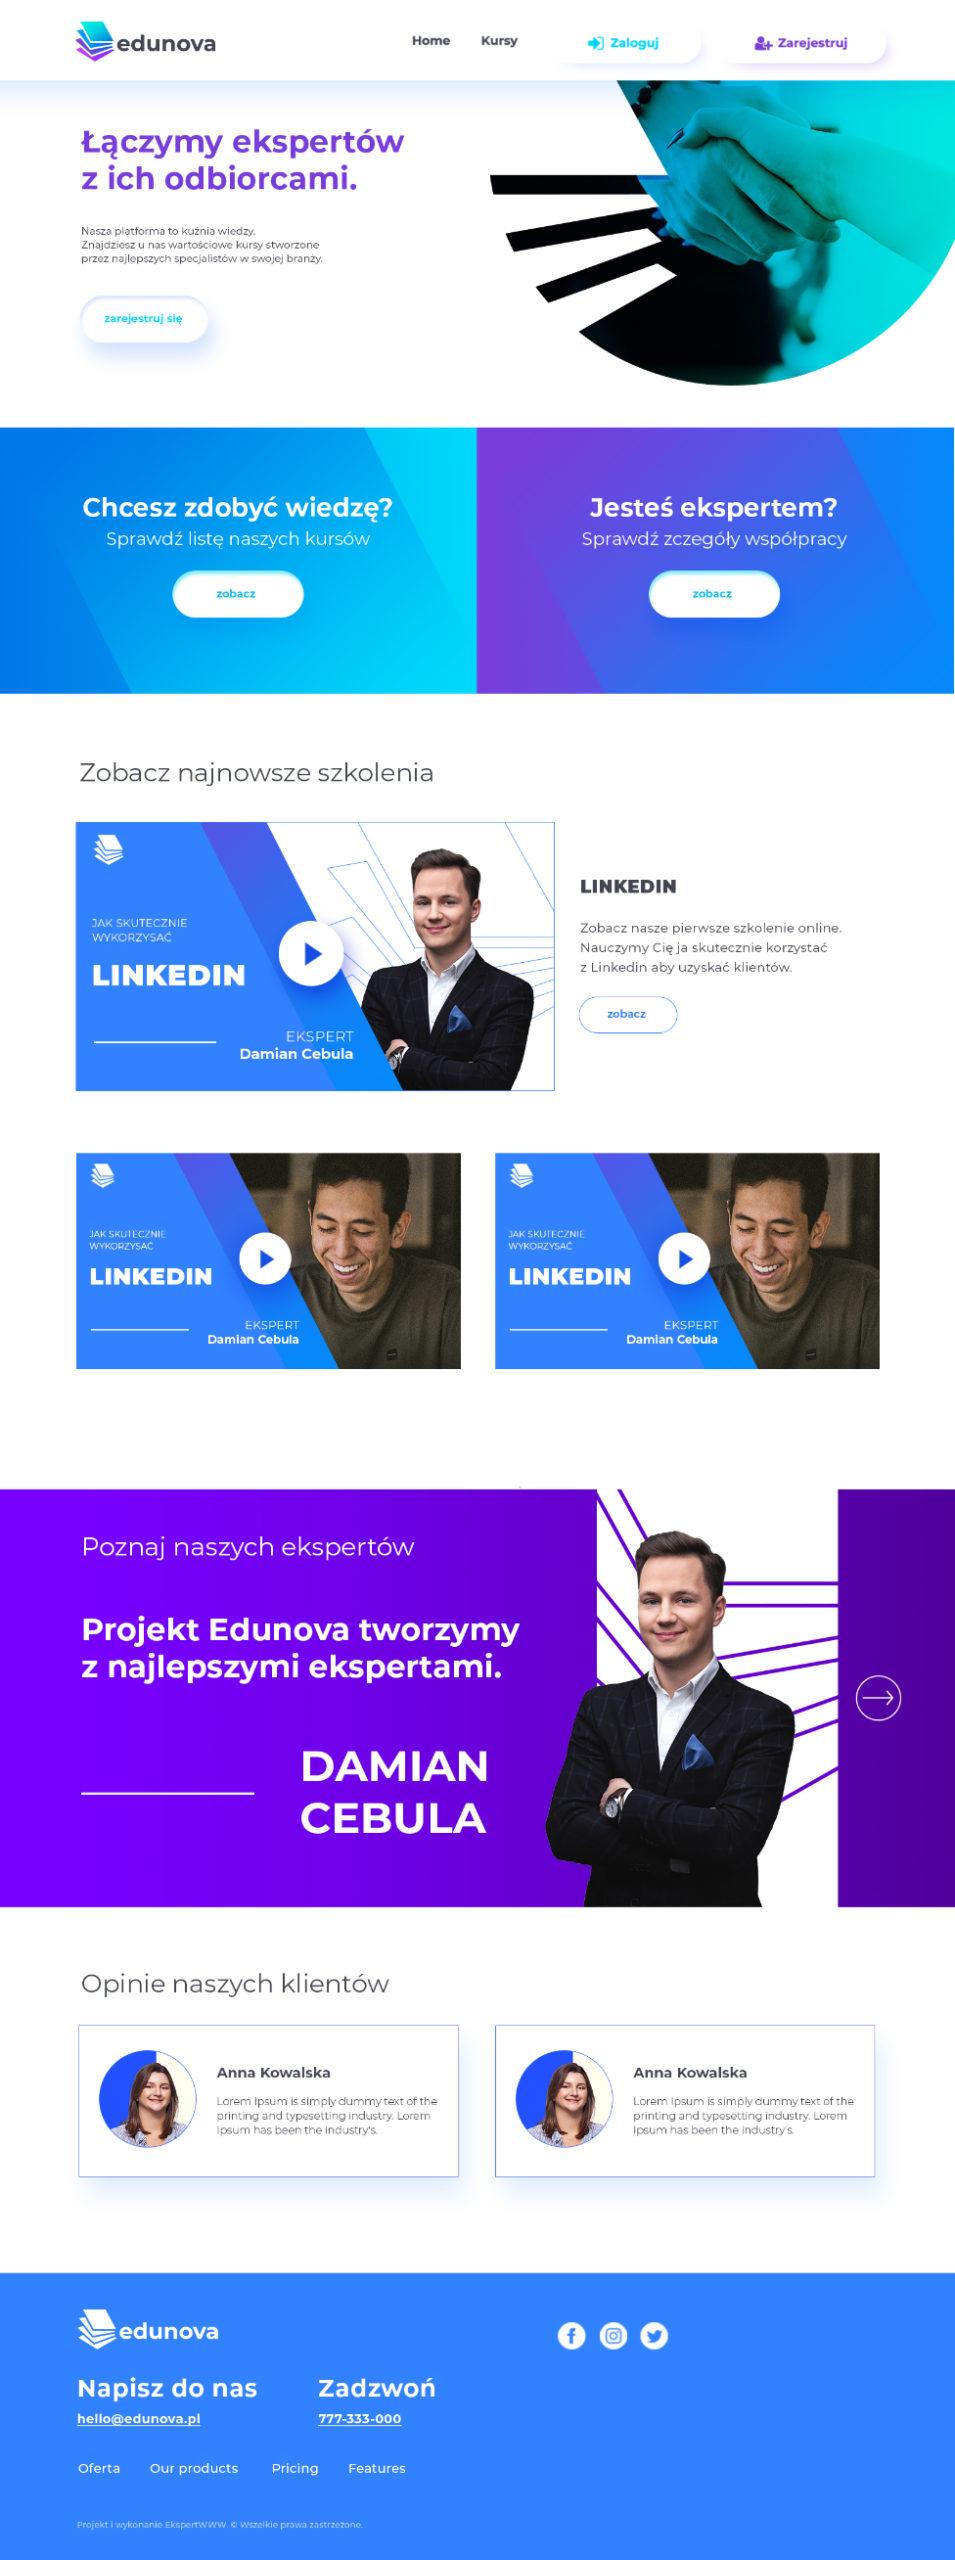 https://expertwww.pl/wp-content/uploads/2020/06/edunova_main_-112x300.jpg